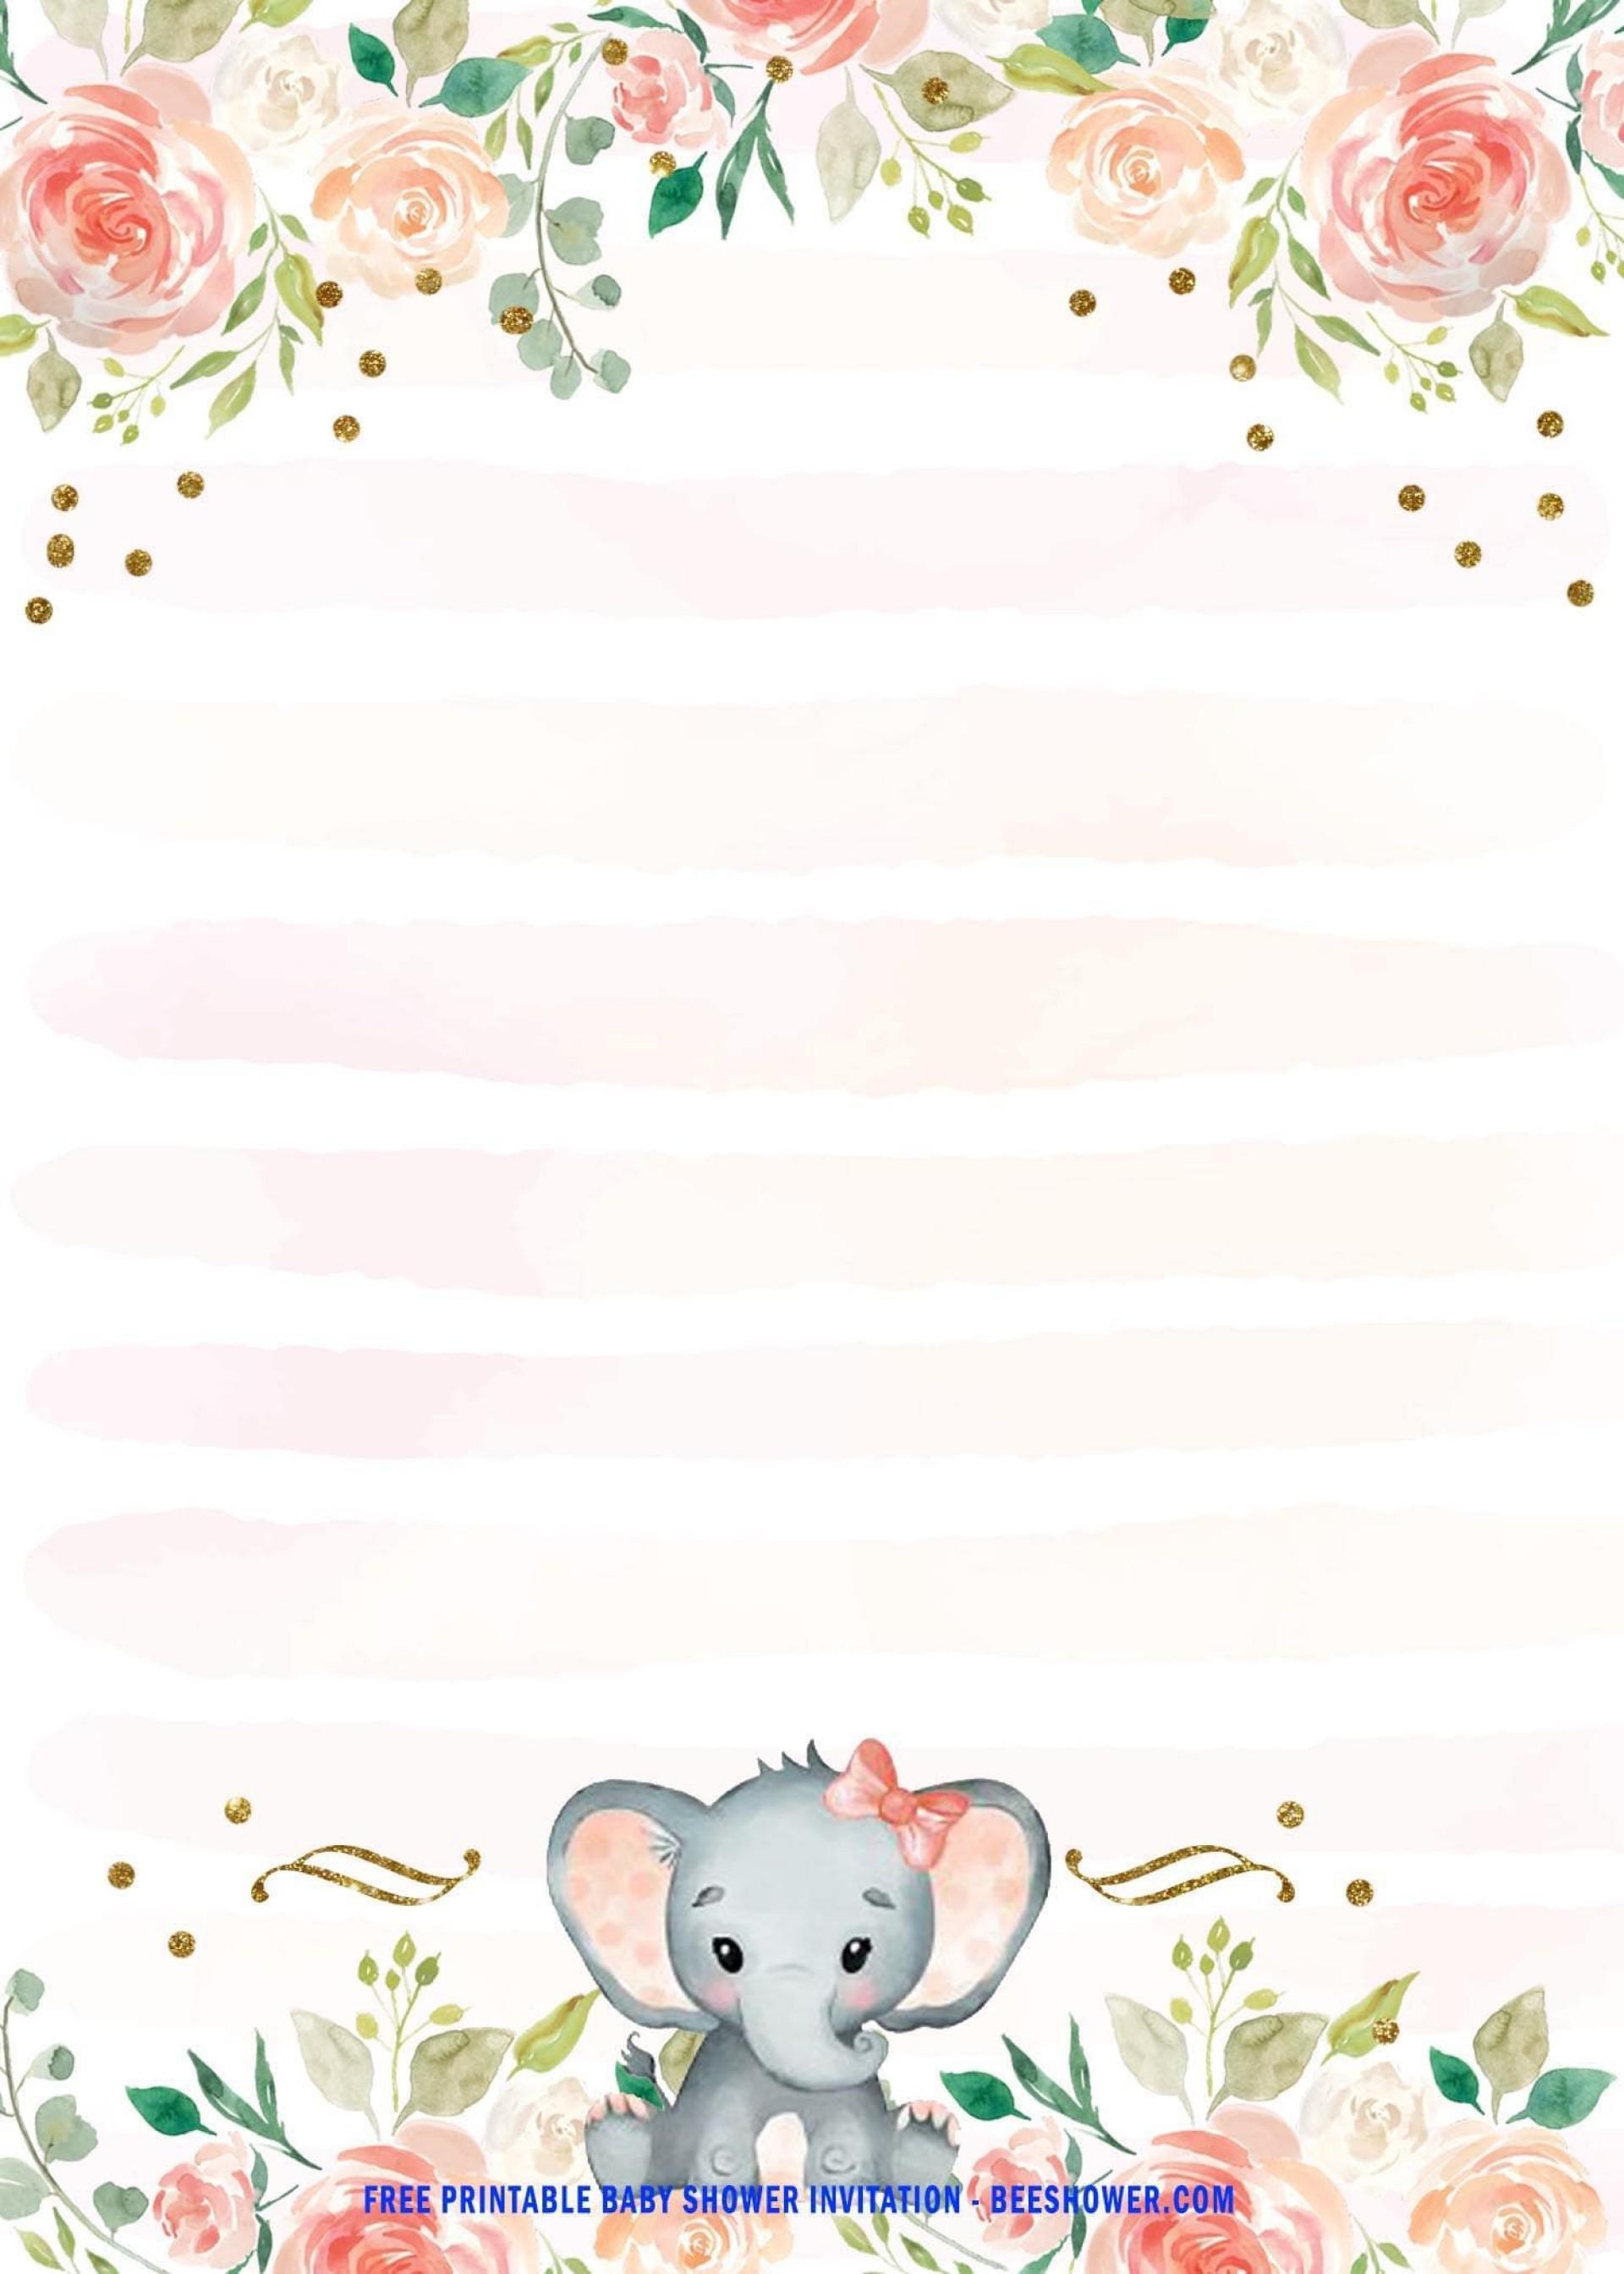 003 Imposing Elephant Girl Baby Shower Invitation Template Idea  Templates Pink1920